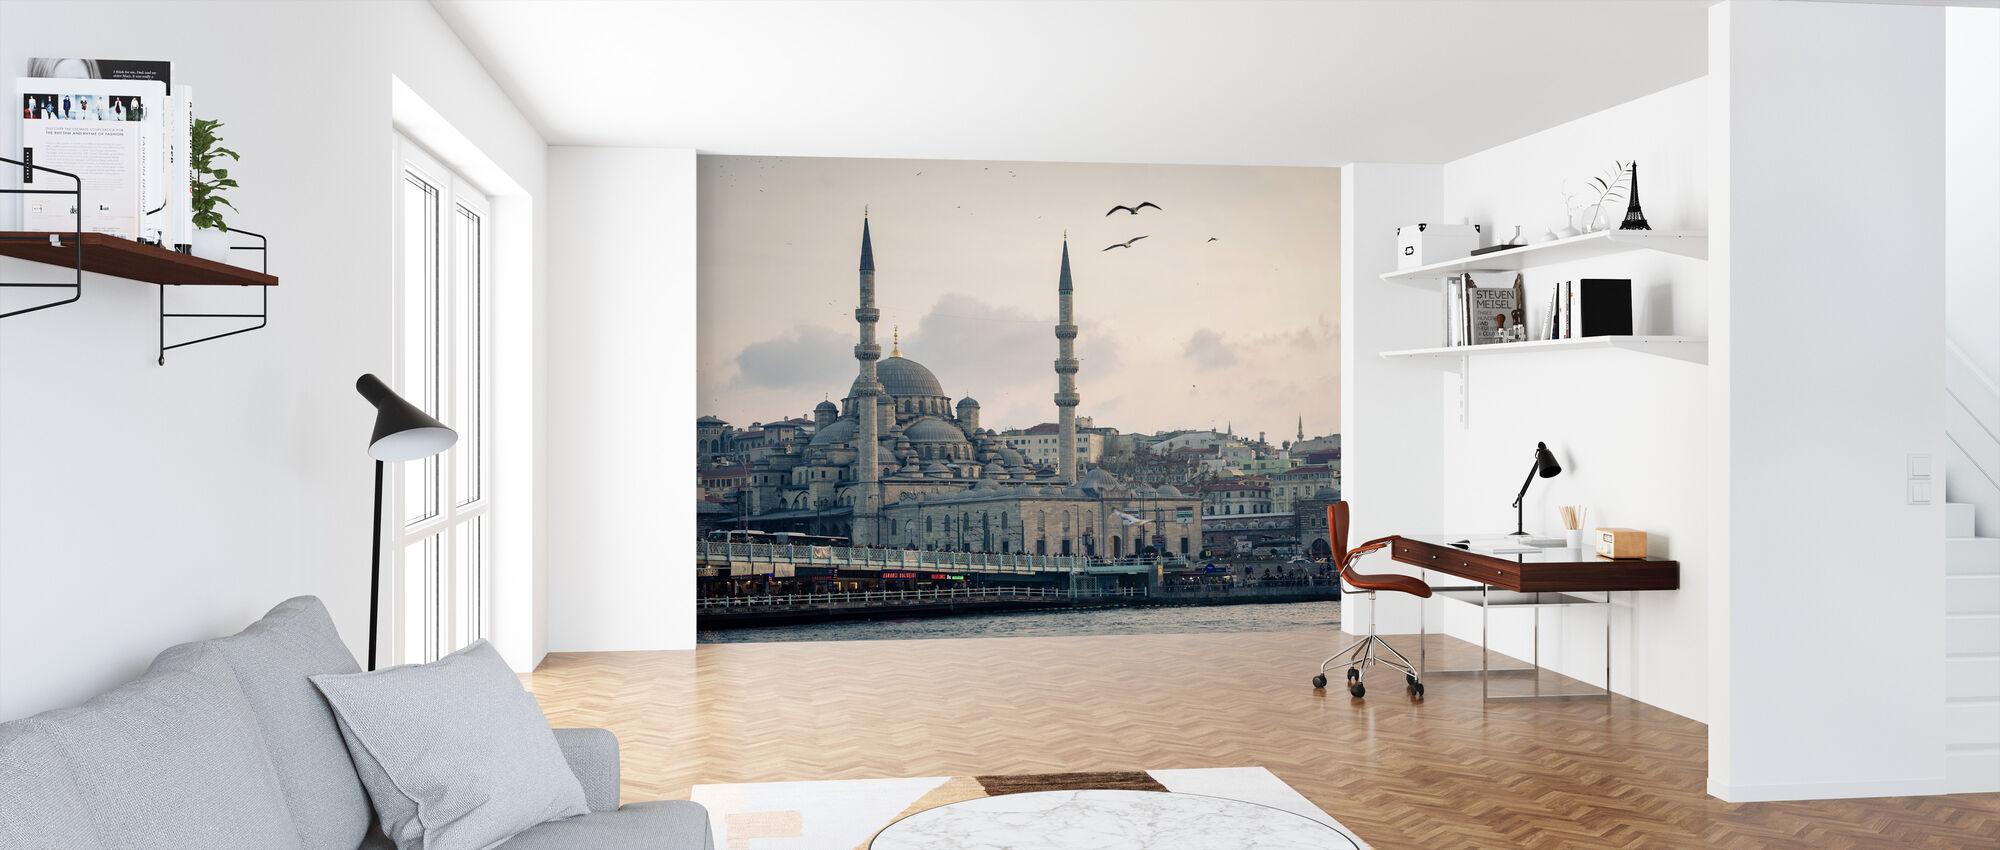 Istambul - Carta da parati - Uffici